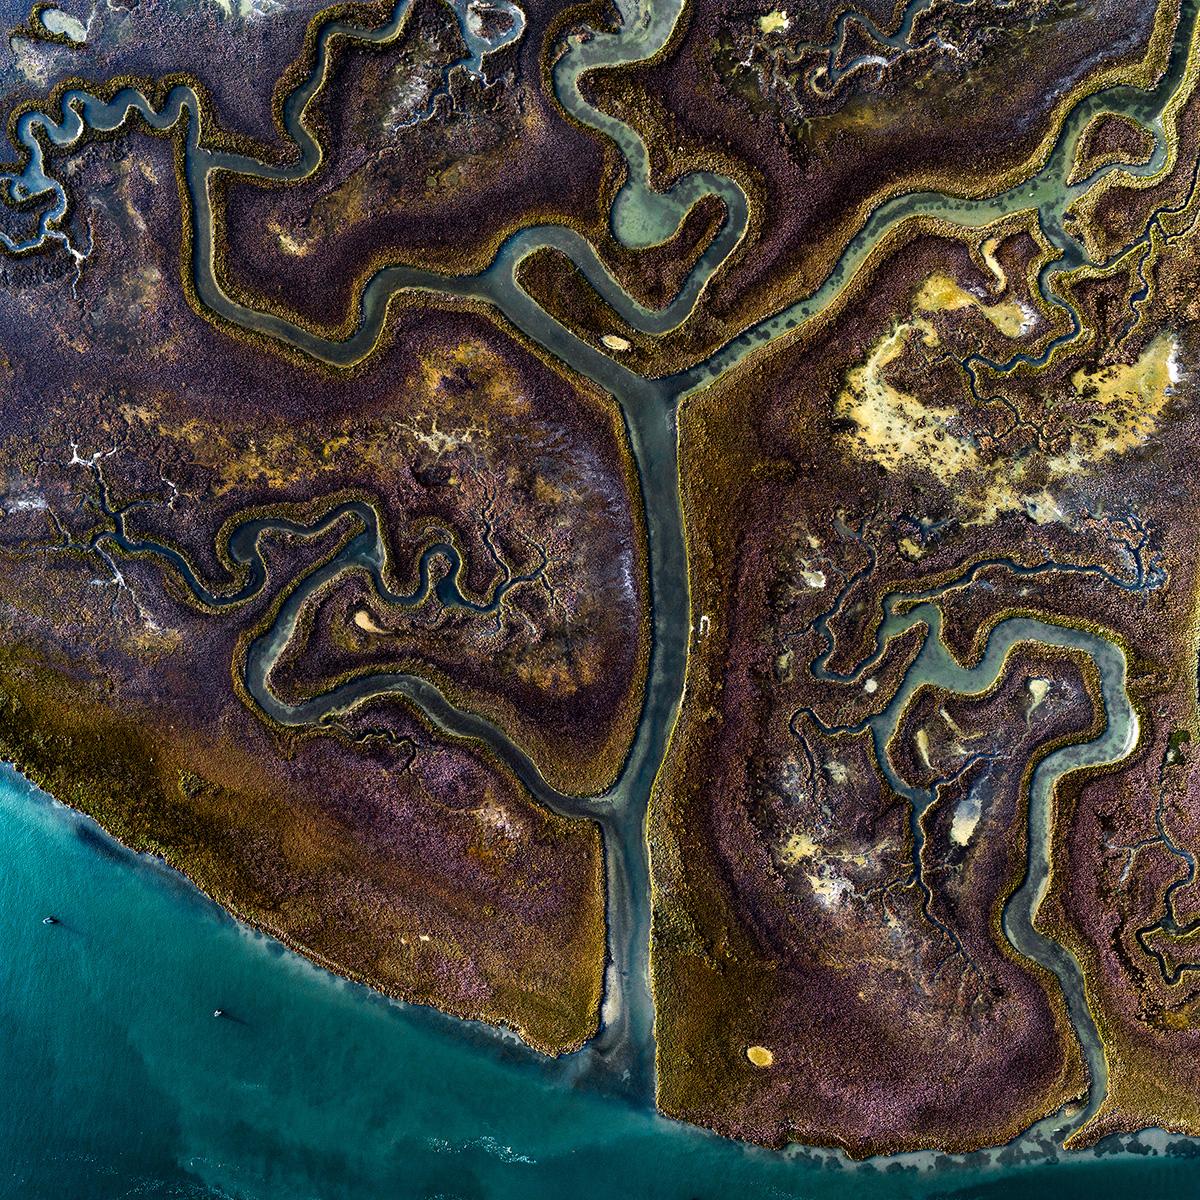 08-water-shape-earth-watershape-earth-milan-radisics-photography-fine-art-print-milan-hu_